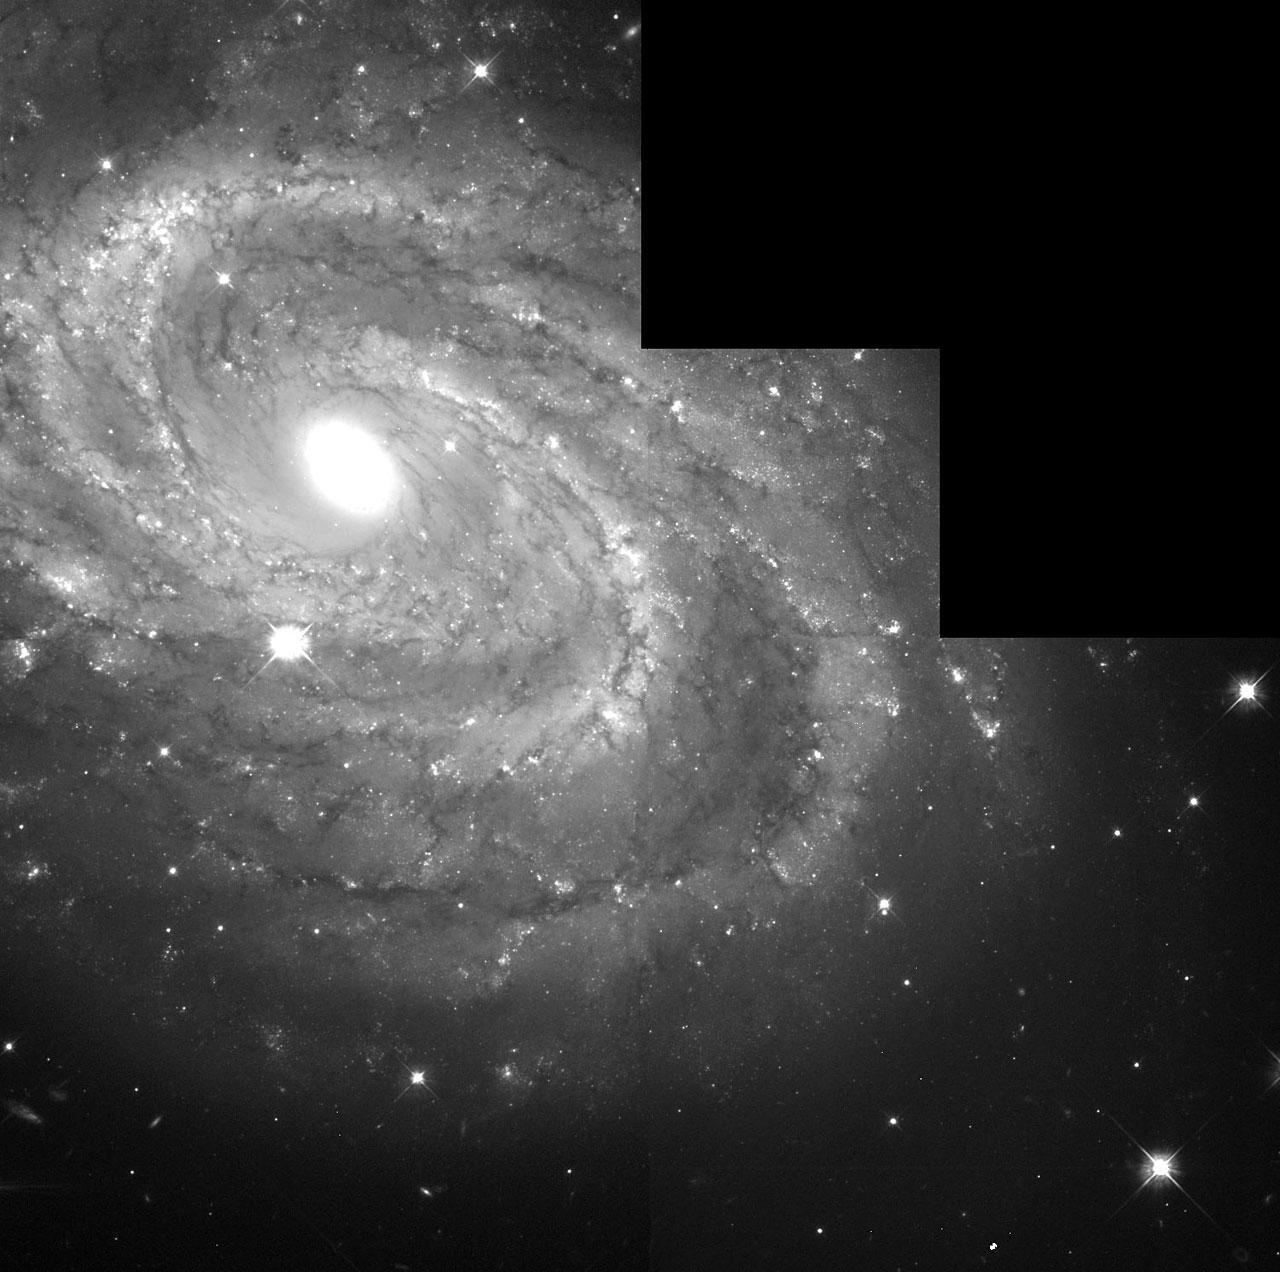 Full WFPC2 Field NGC 4603